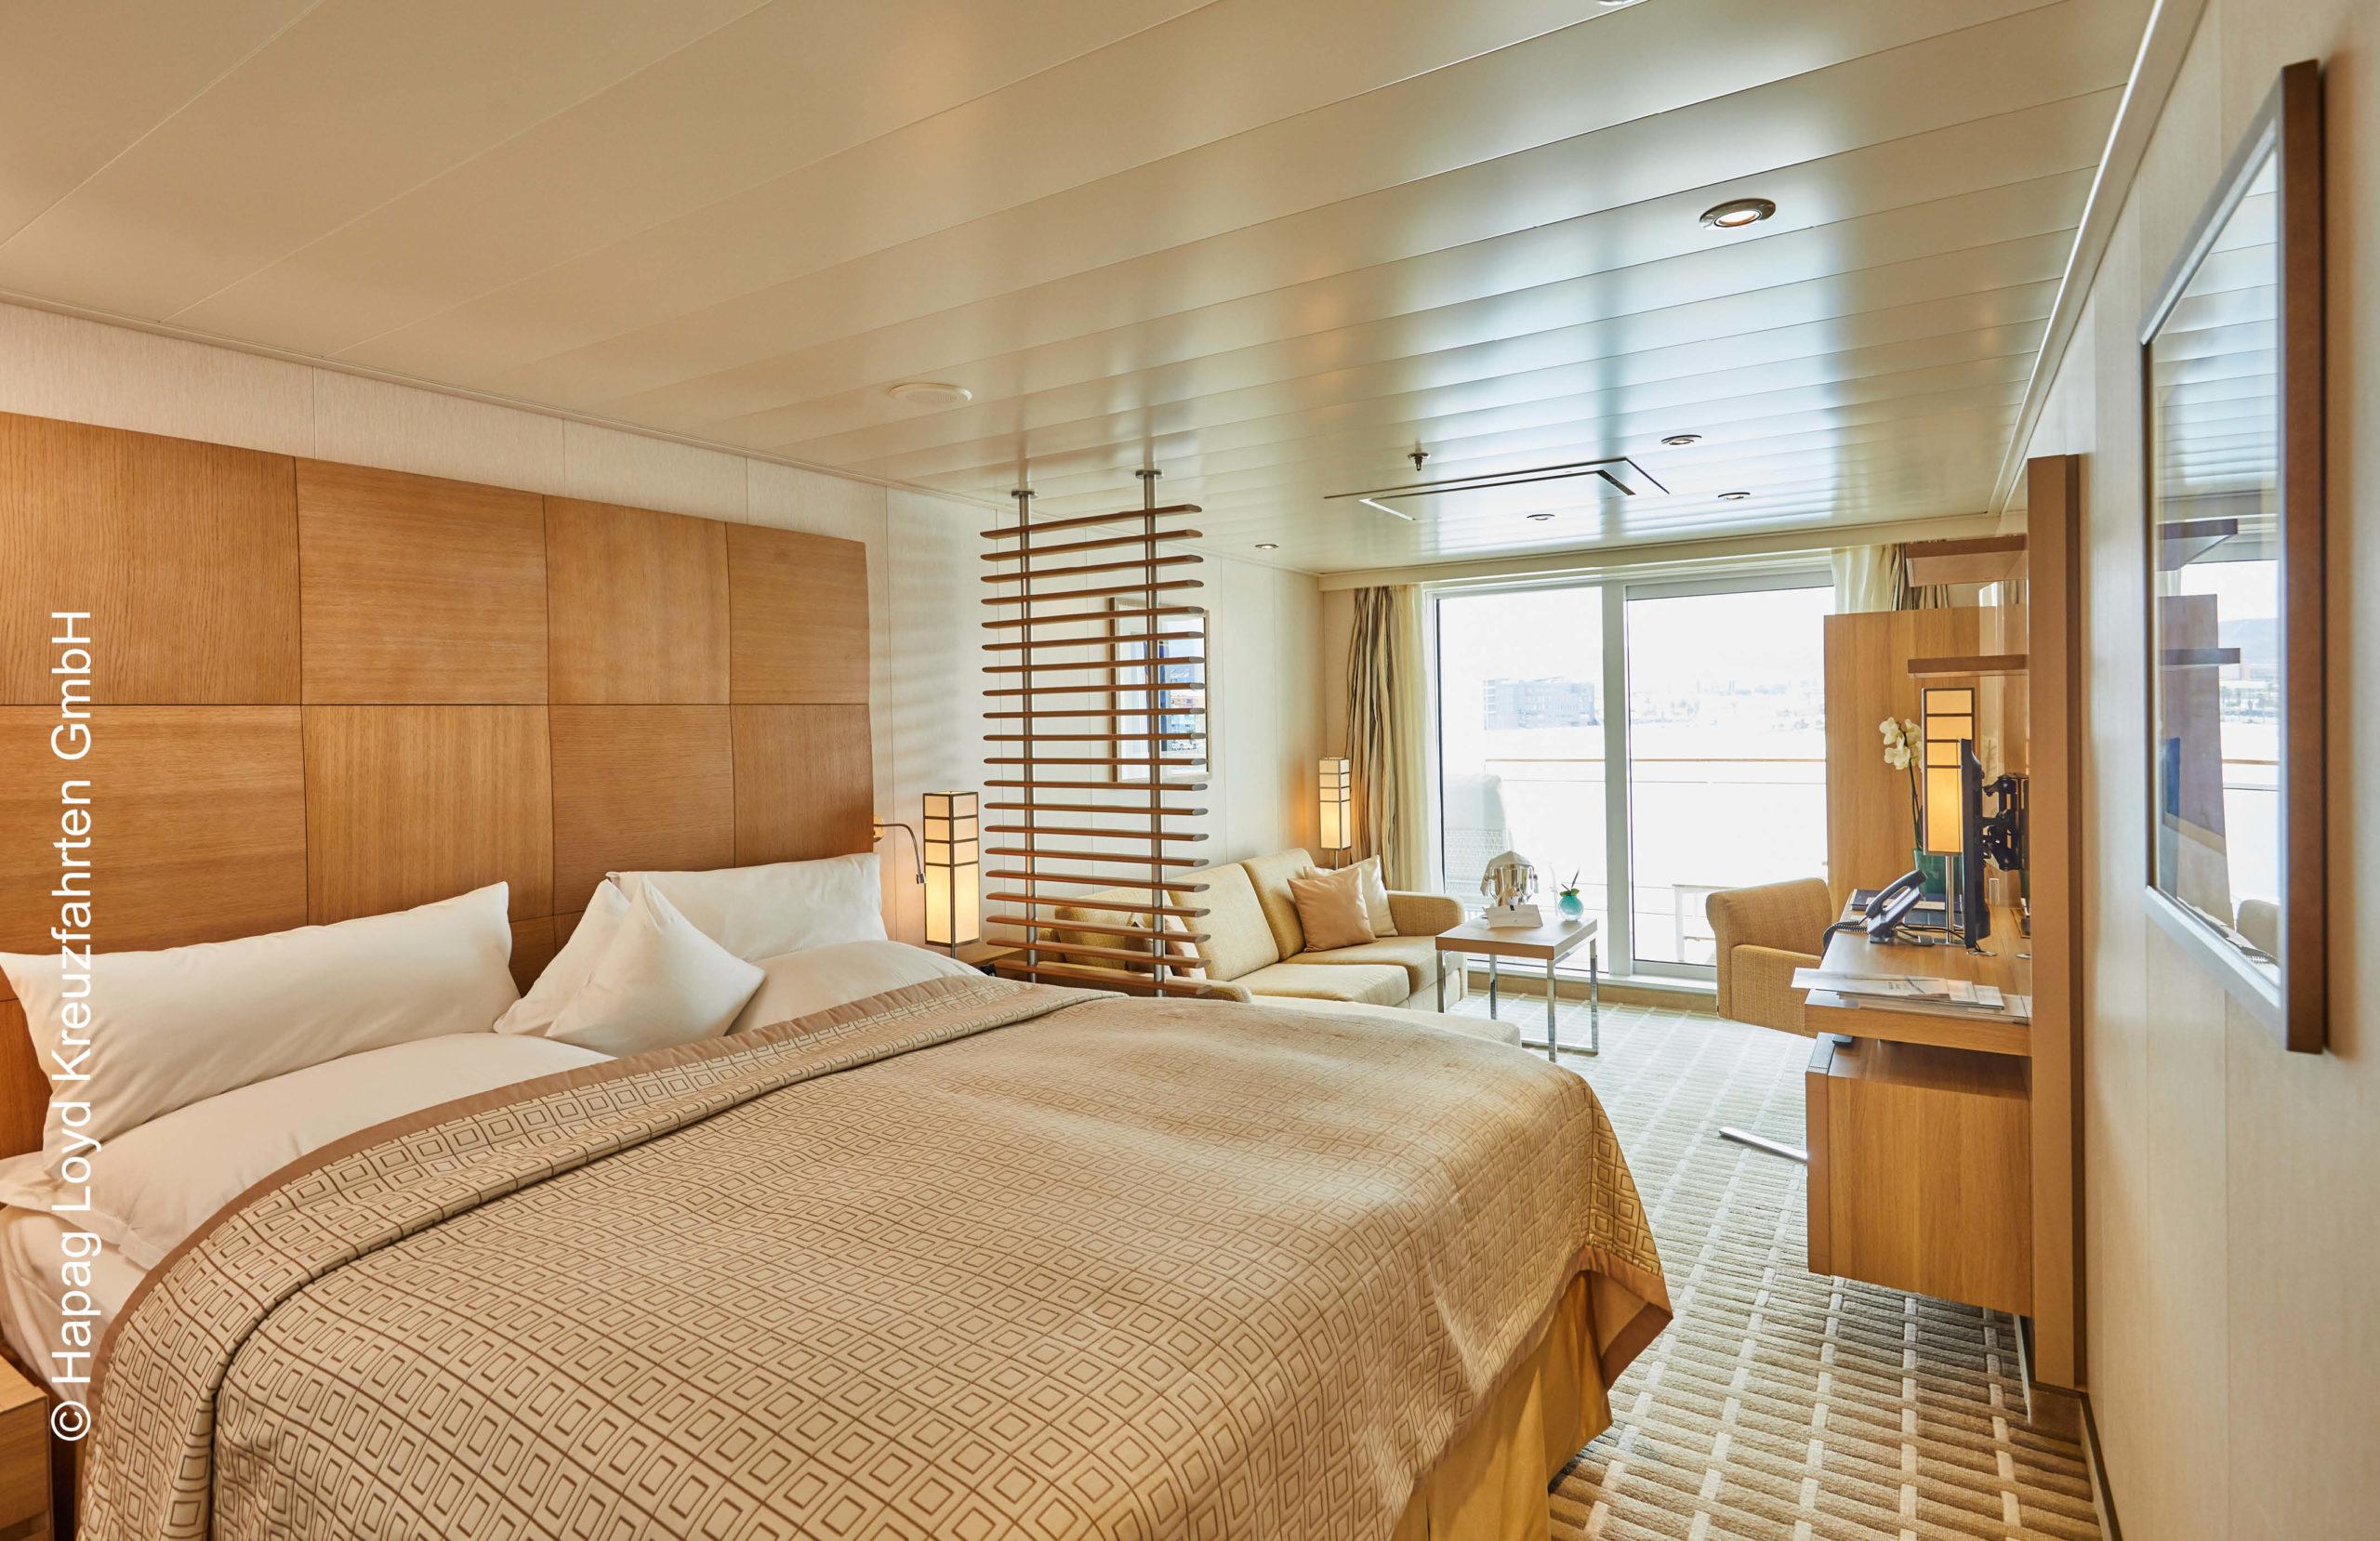 Hapag Lloyd Veranda Suite MS Euorpa 2